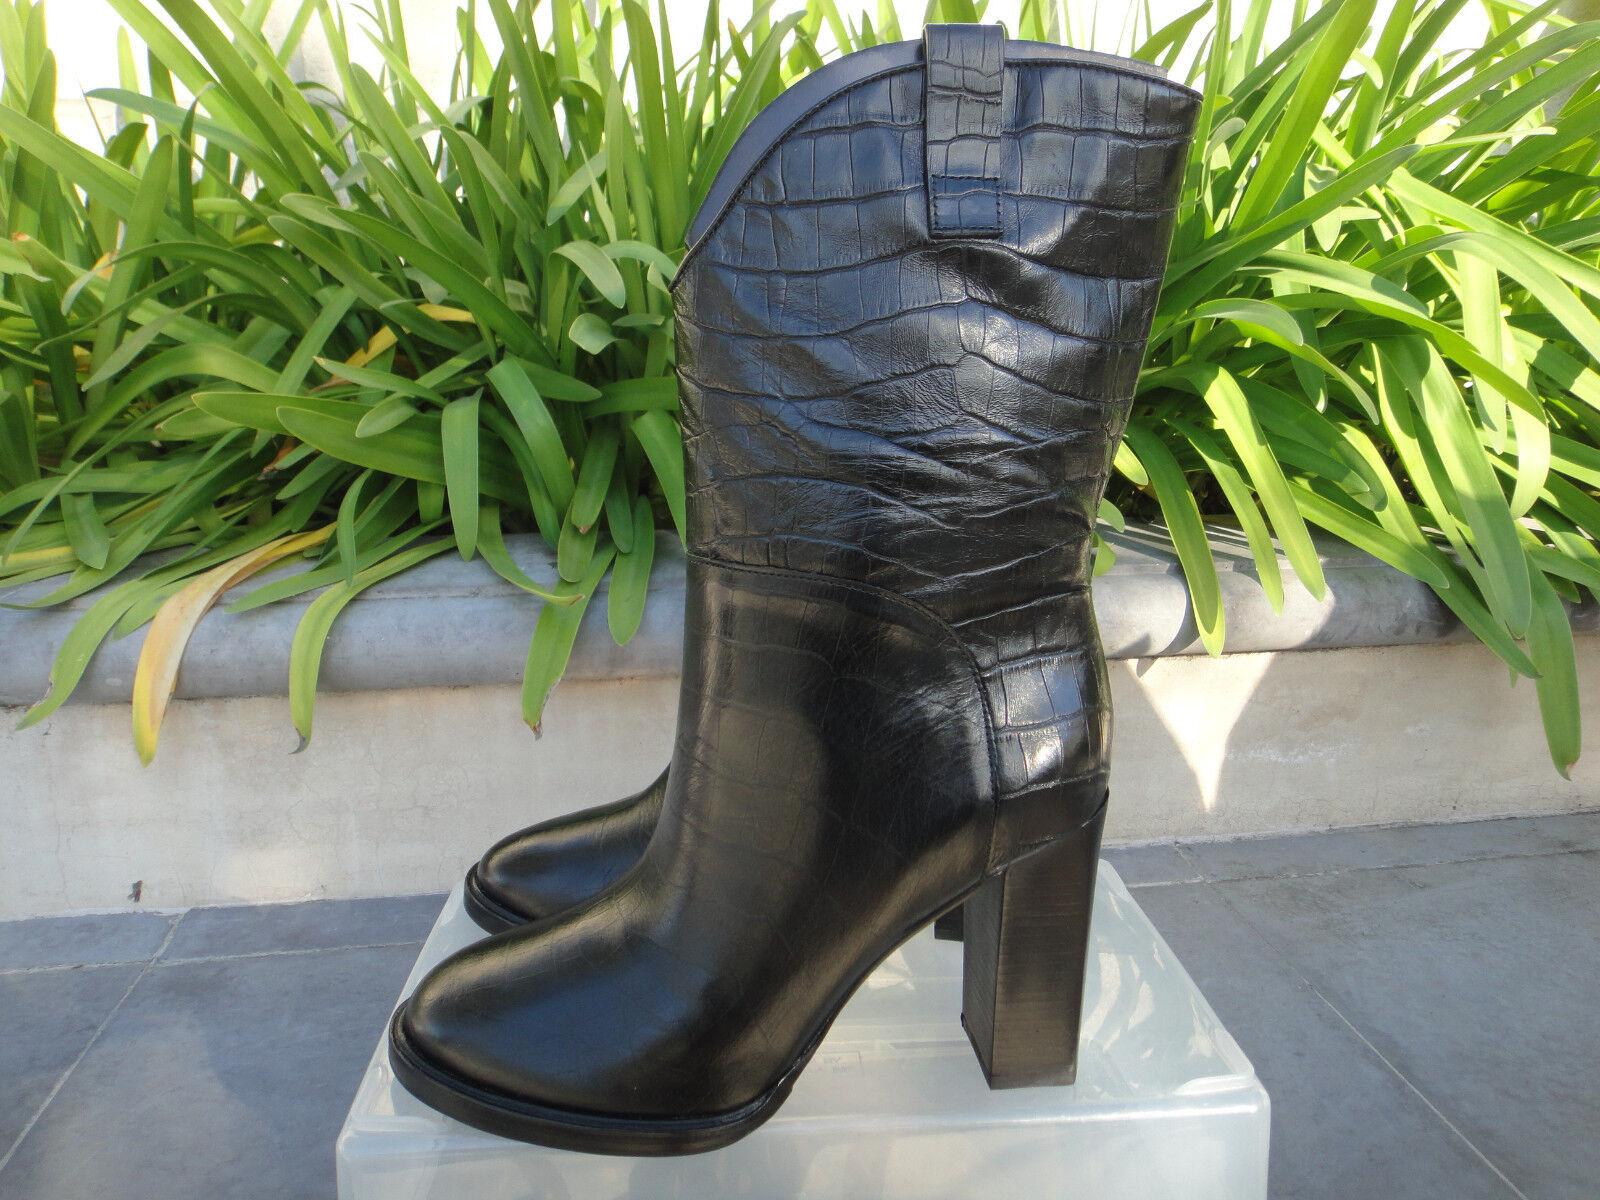 Sigerson Morrison ELISA, Black Croc Embossed Pull On Mid Boot, Wmns US Size 7